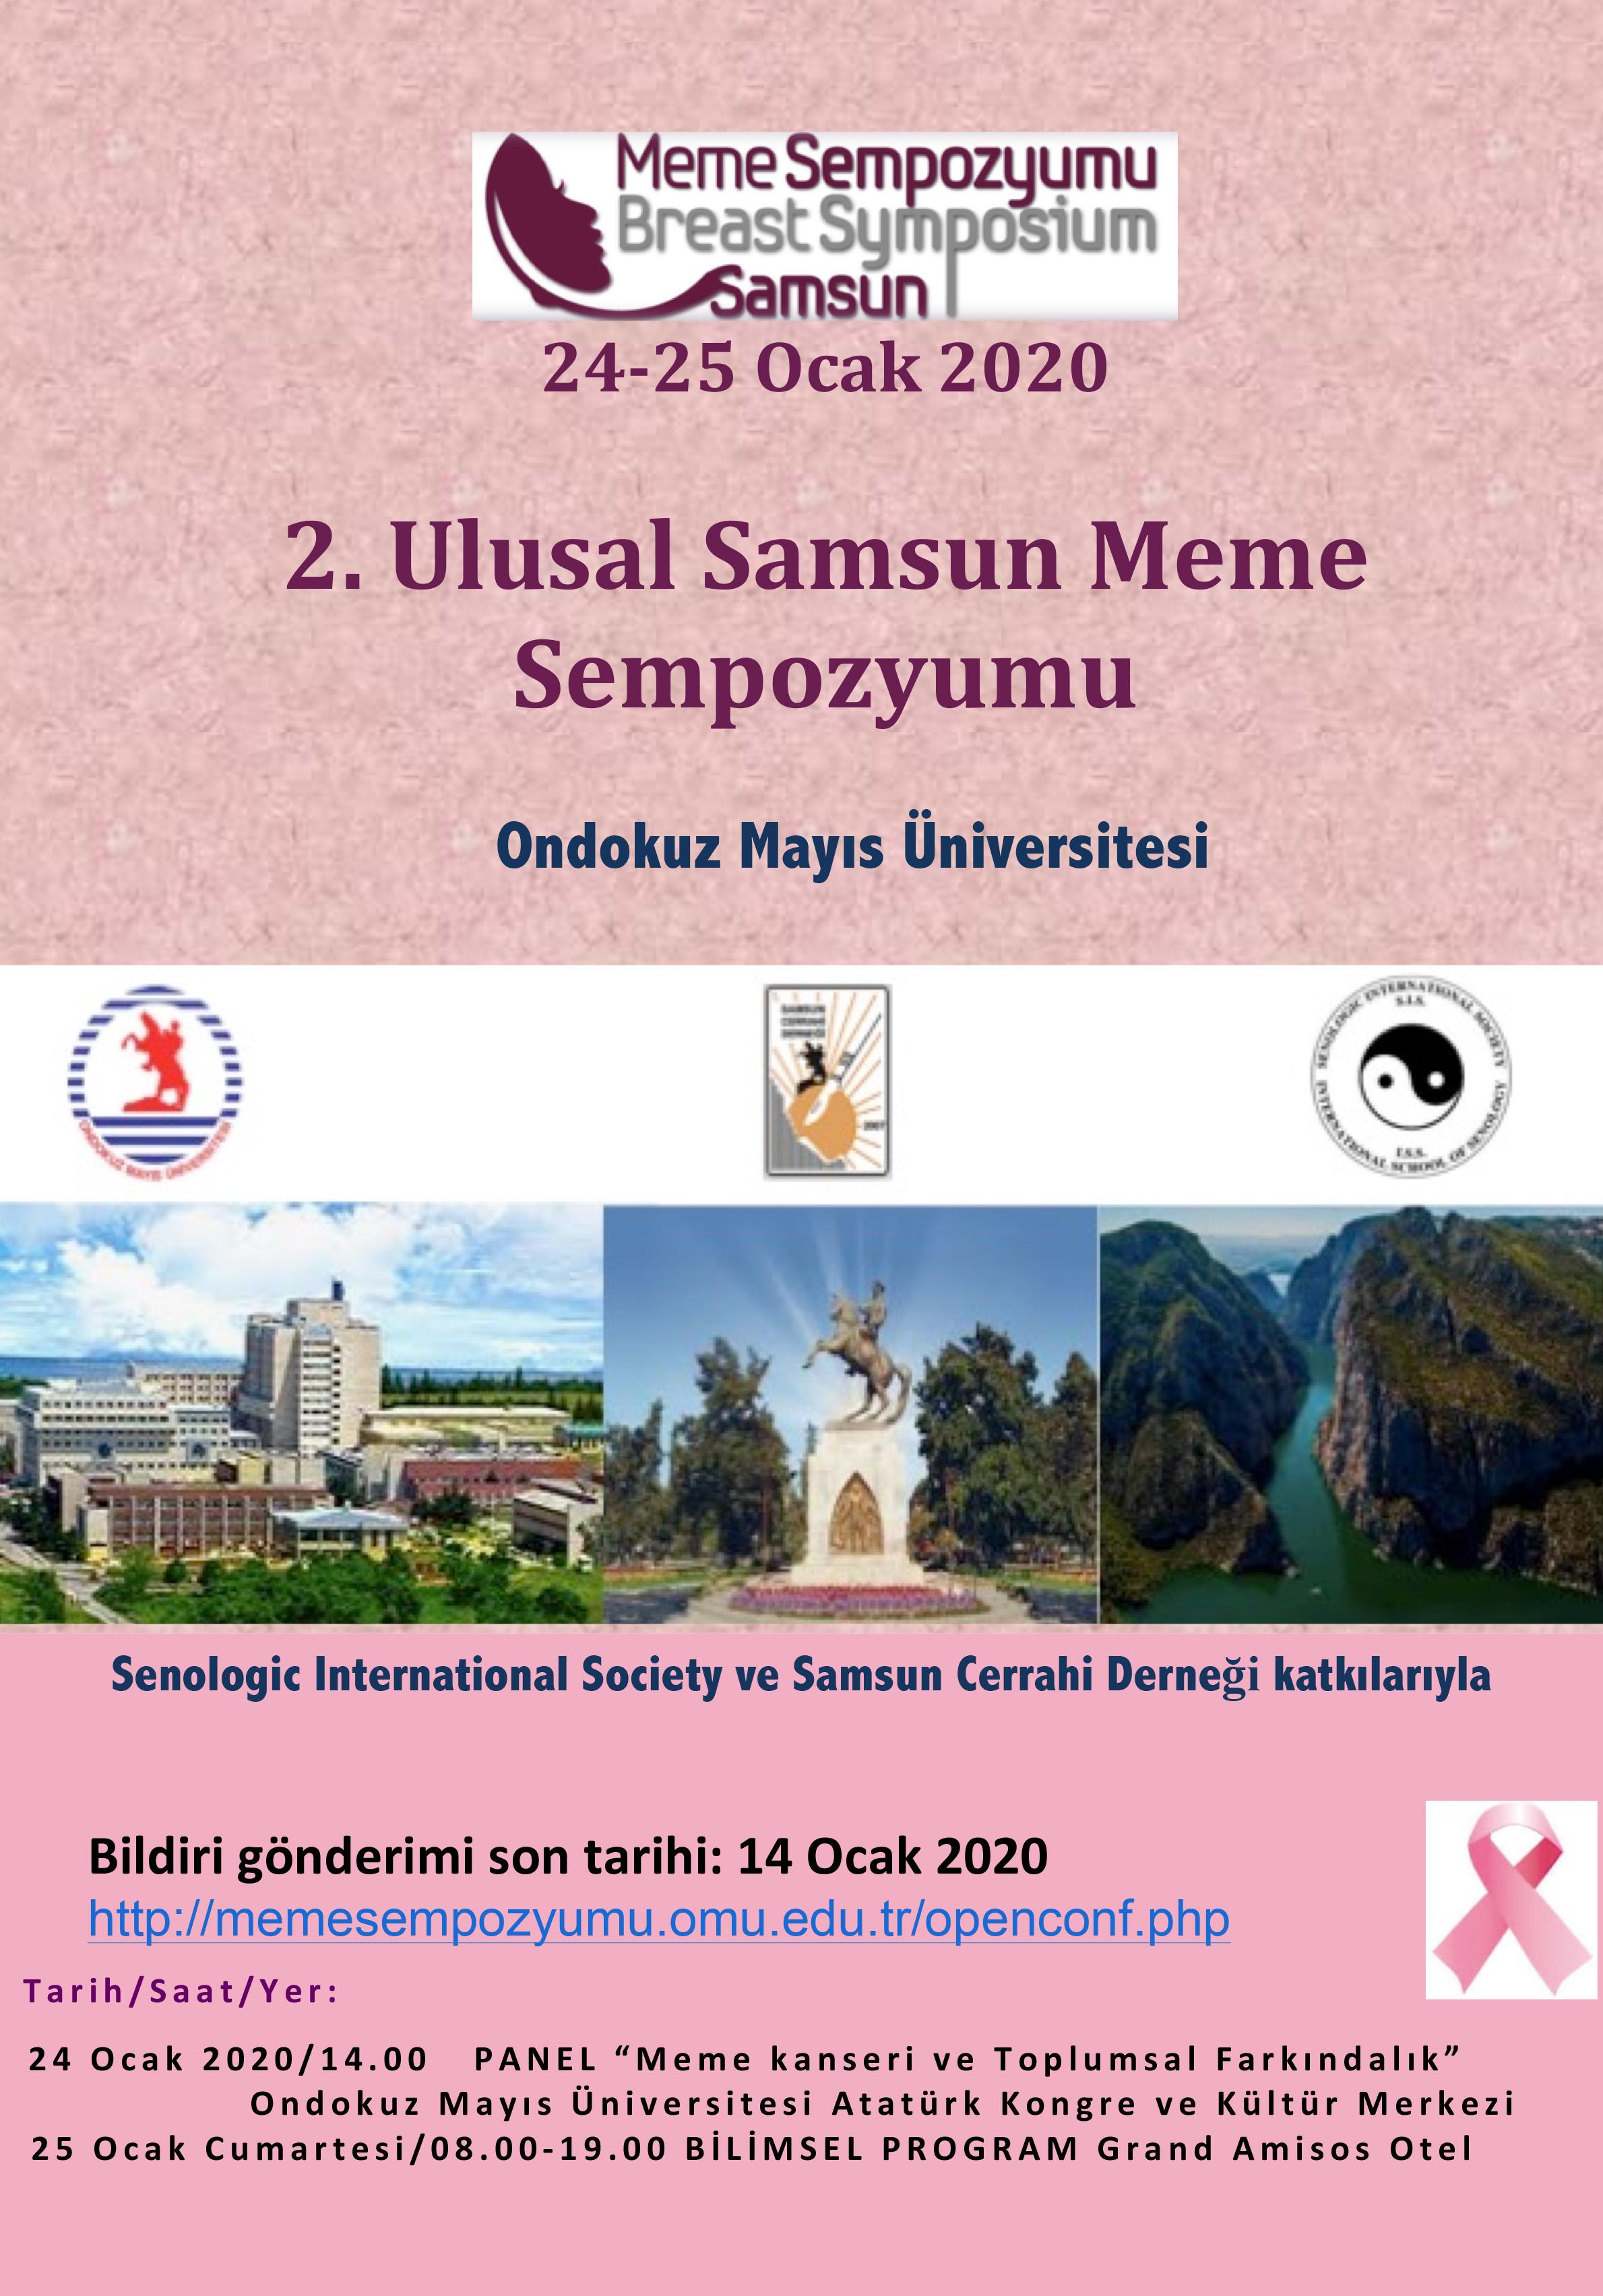 http://www.omu.edu.tr/sites/default/files/samsun_meme_sempozyumu_sis_sss_2020_bilimsel_program-1.jpg